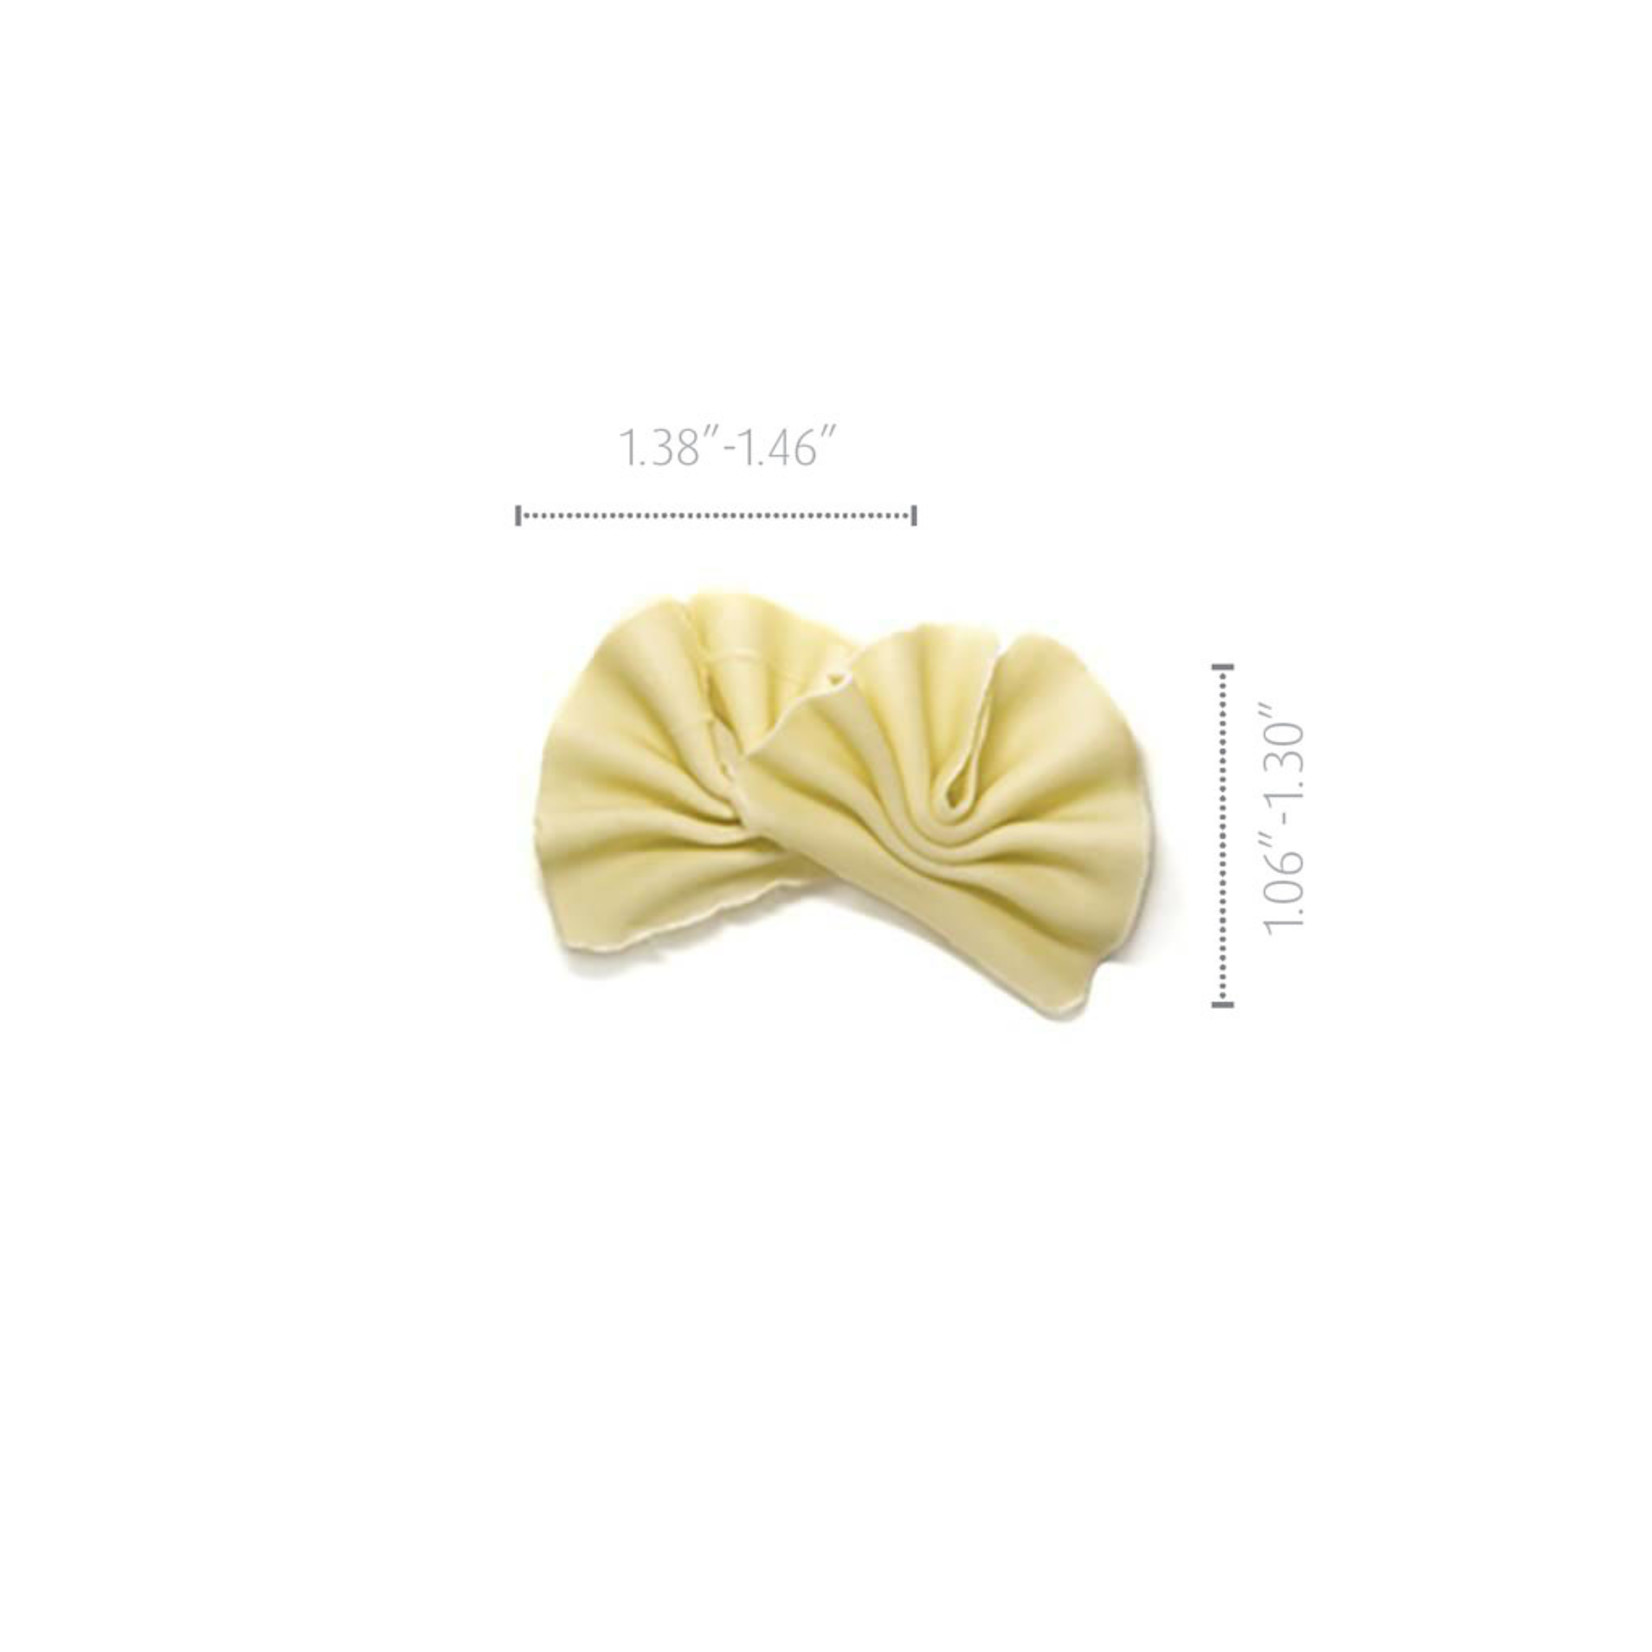 Dobla Dobla - White Chocolate Forest Shavings - 1.3'' (2.2lb), 93185 | 73192